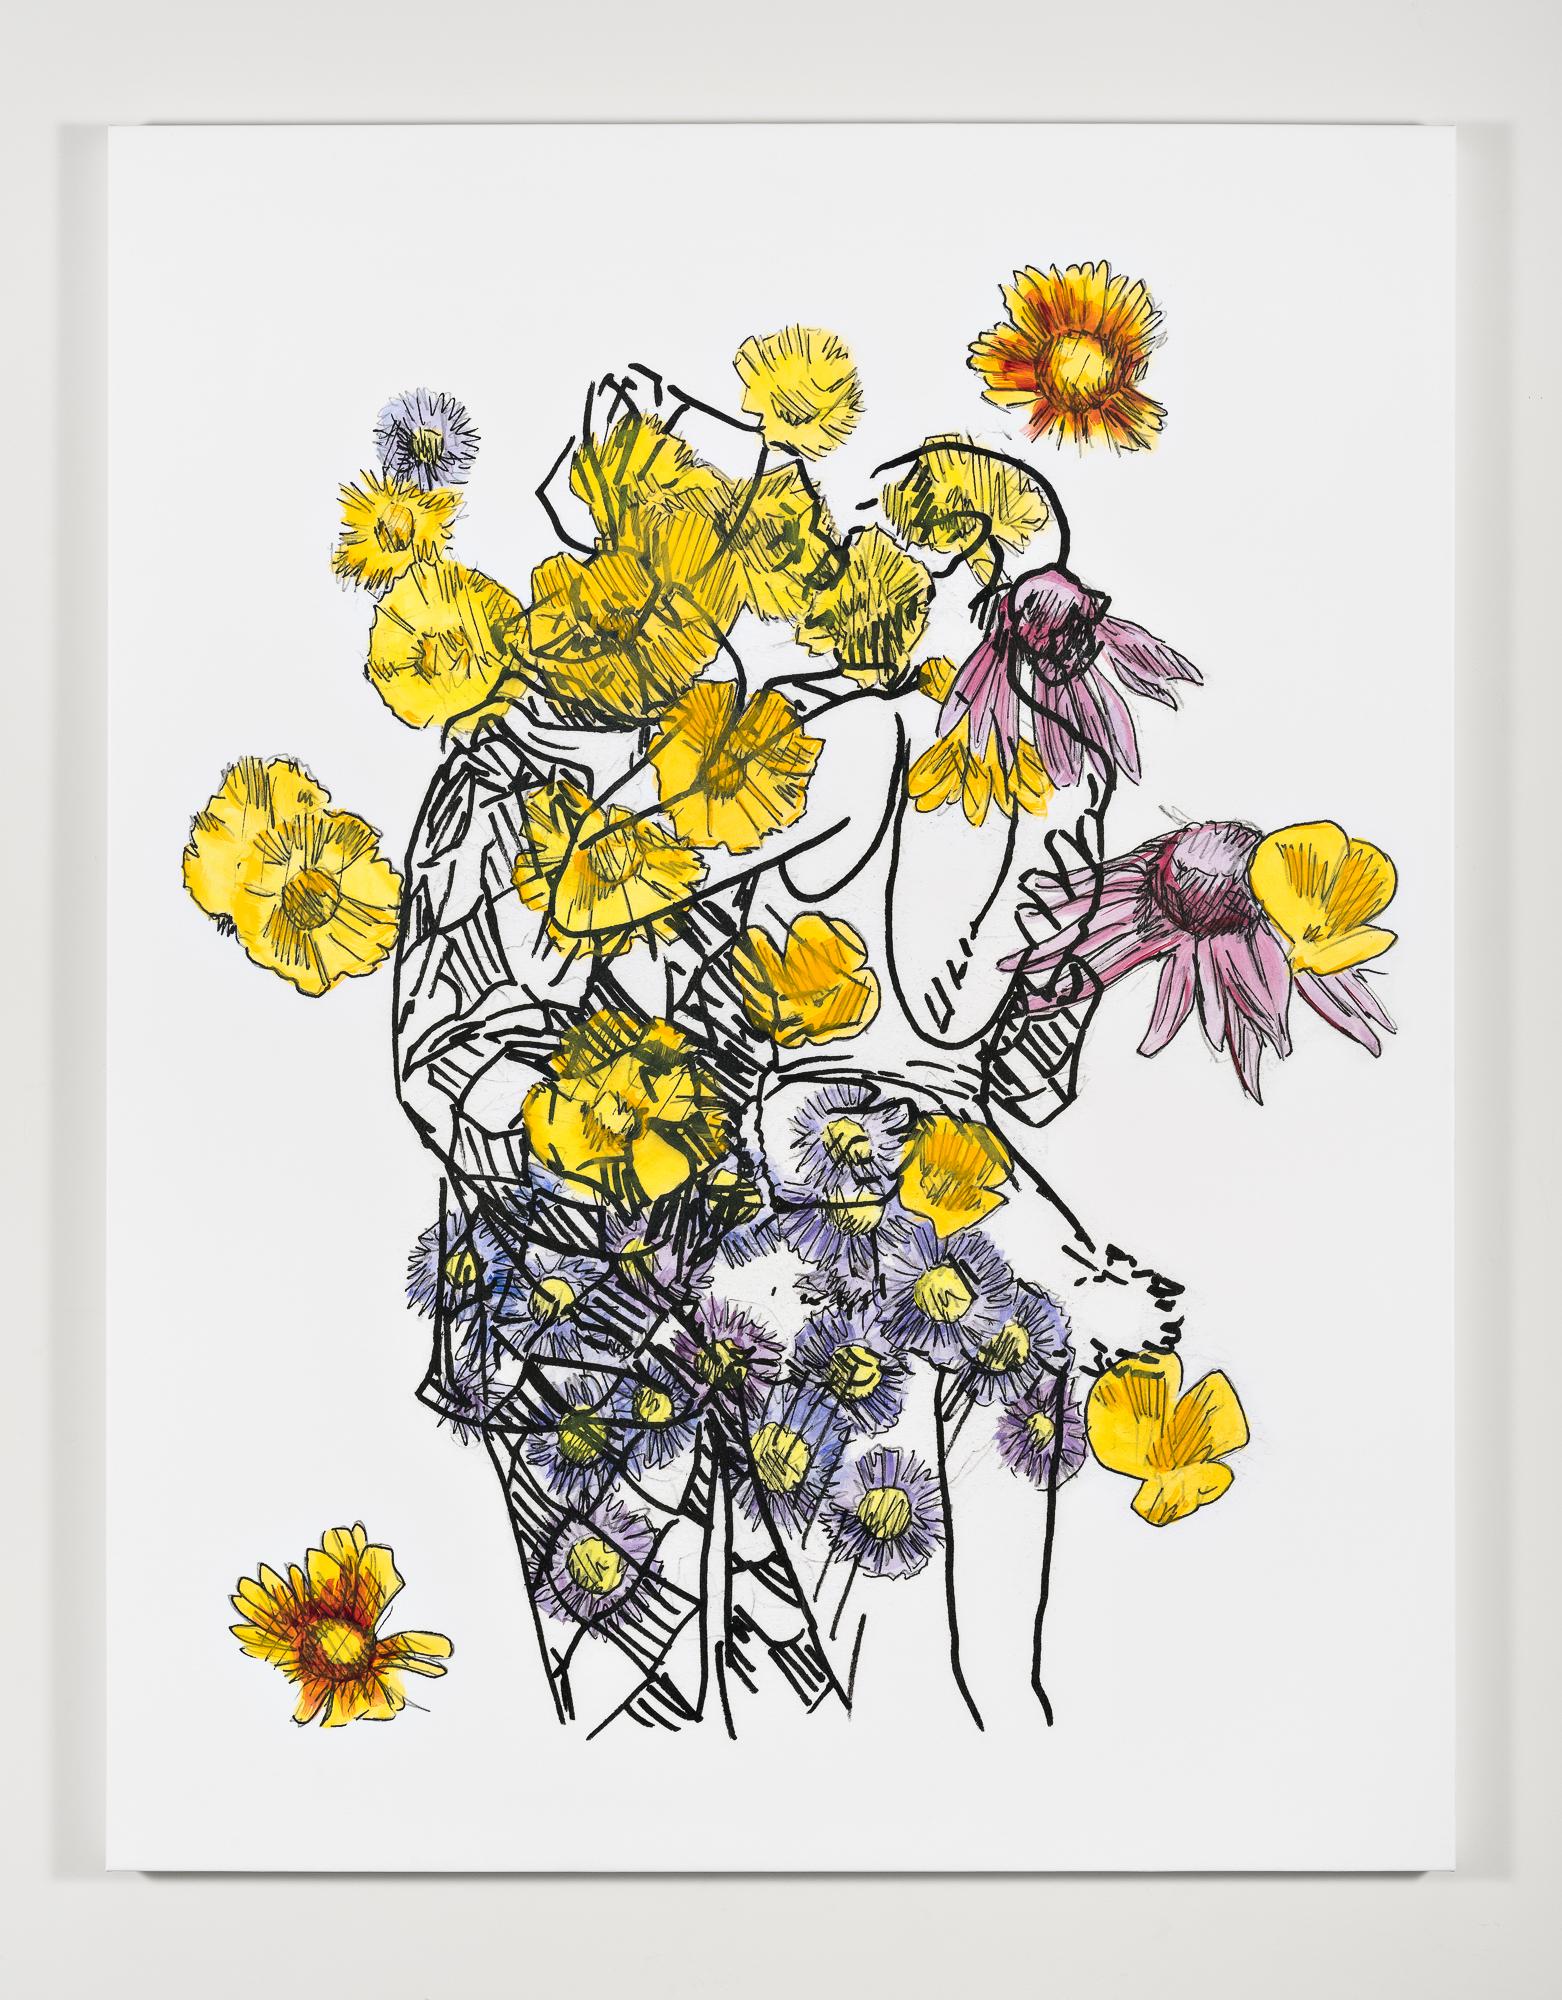 2019_03 - Mieke Marple-19.jpg